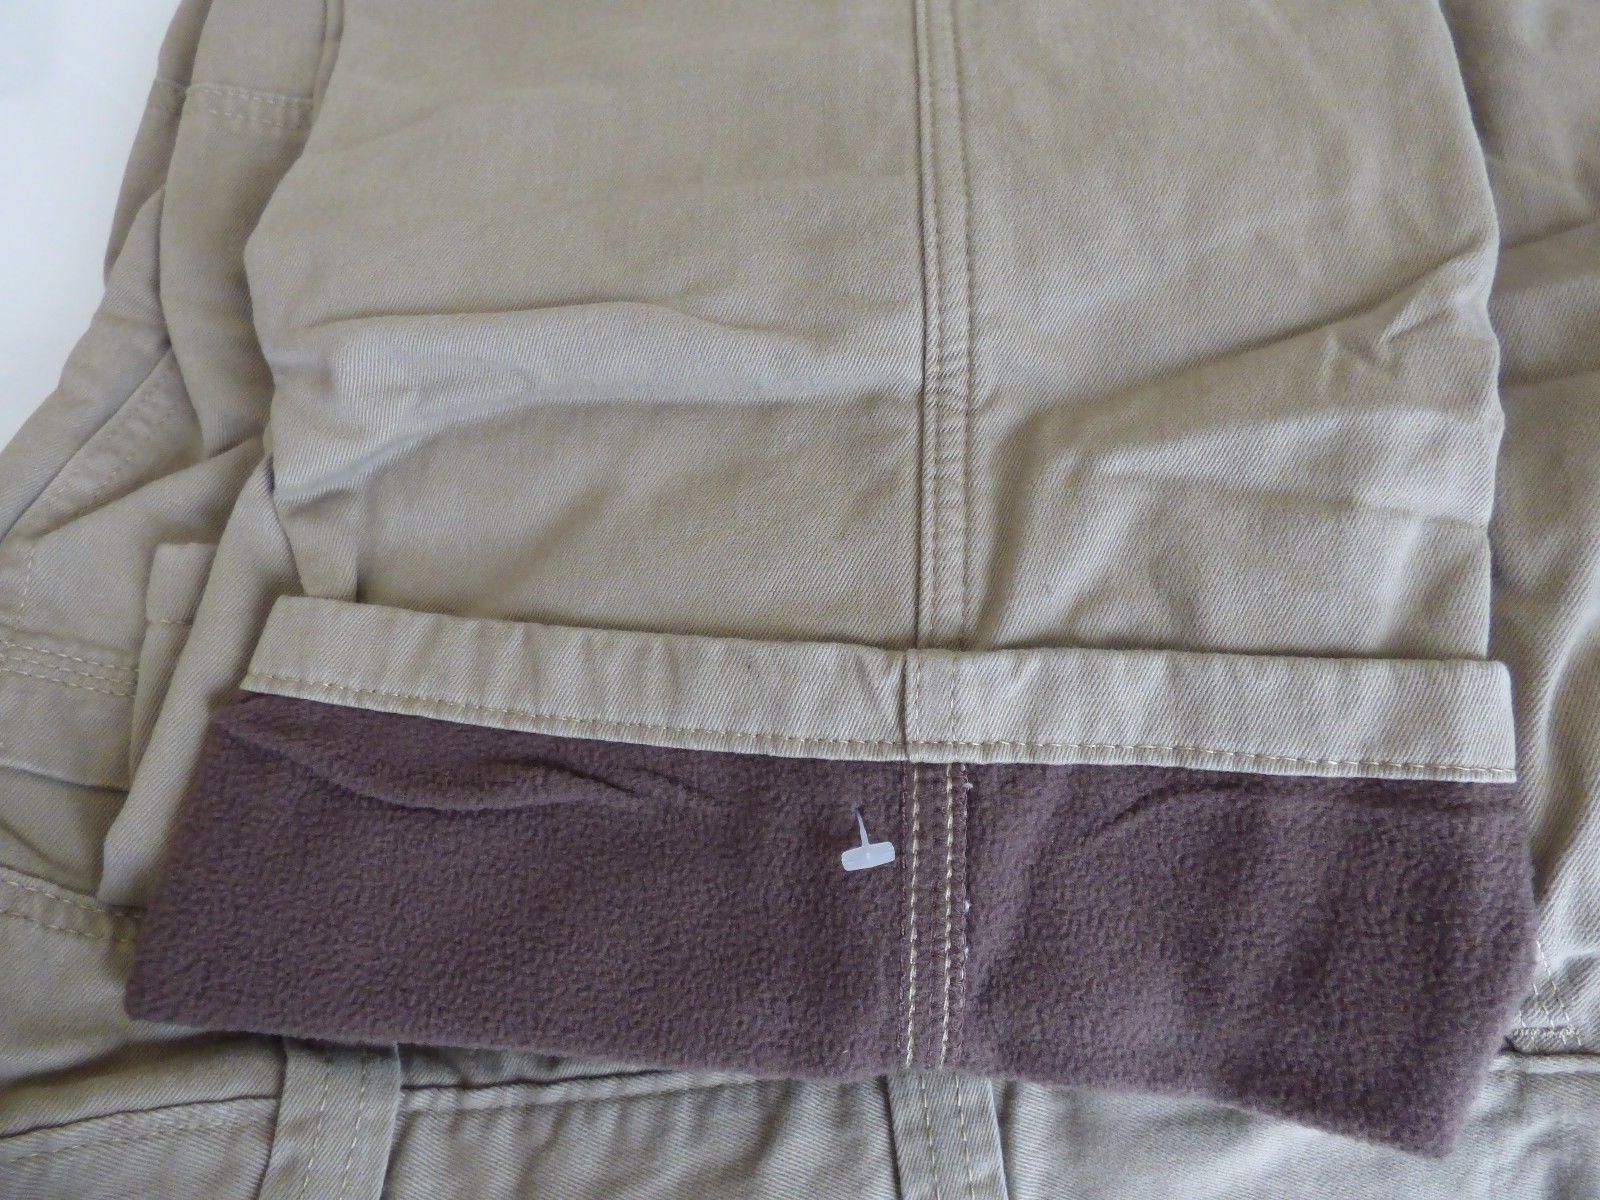 Wrangler Fleece Lined Pants - Work Fishing Hunting Mens